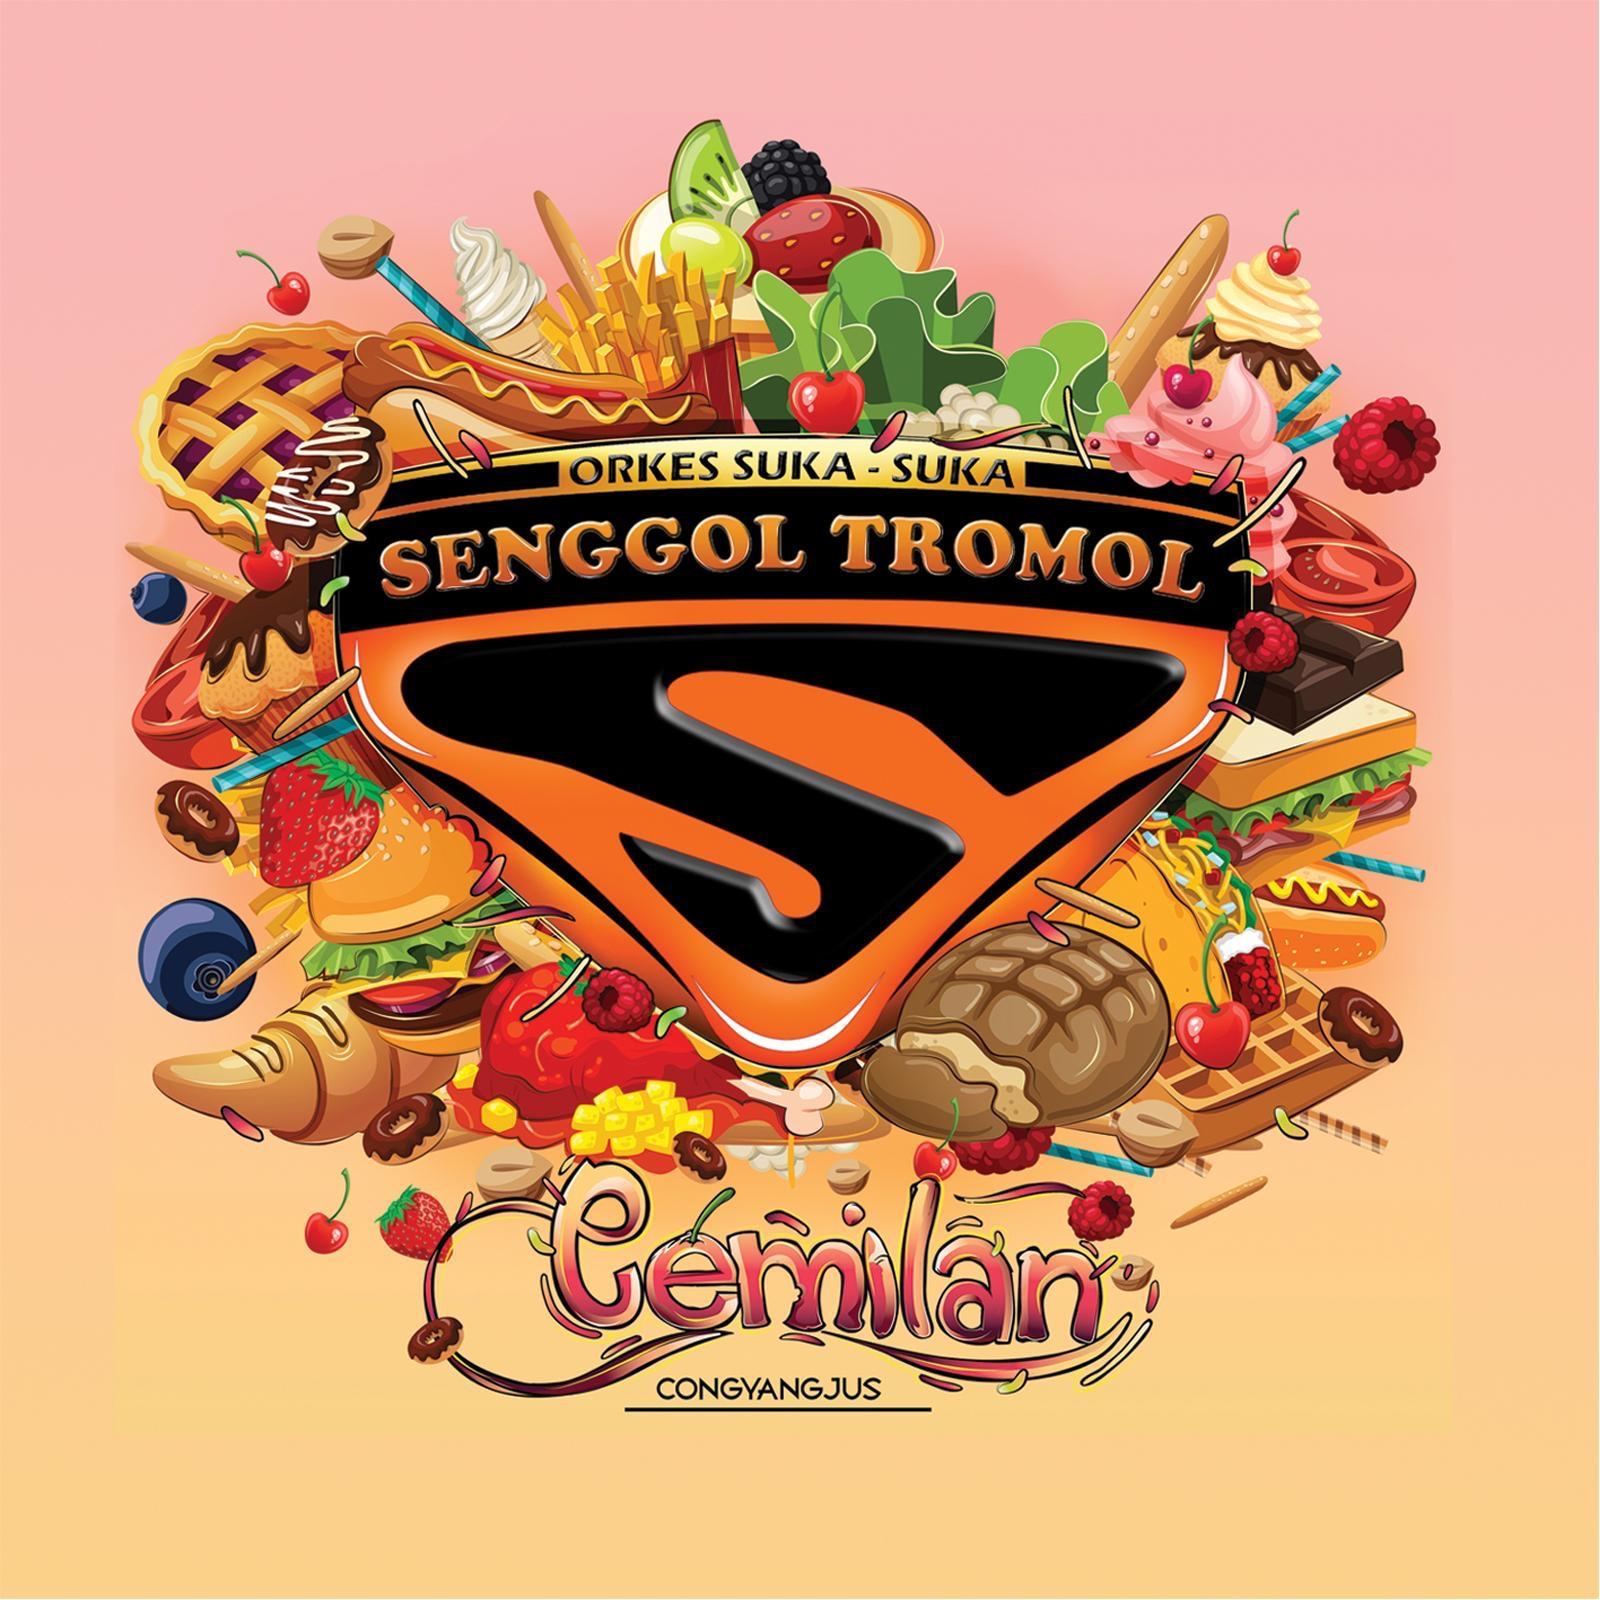 Download album: Cemilan - artist Senggol Tromol: Comedy